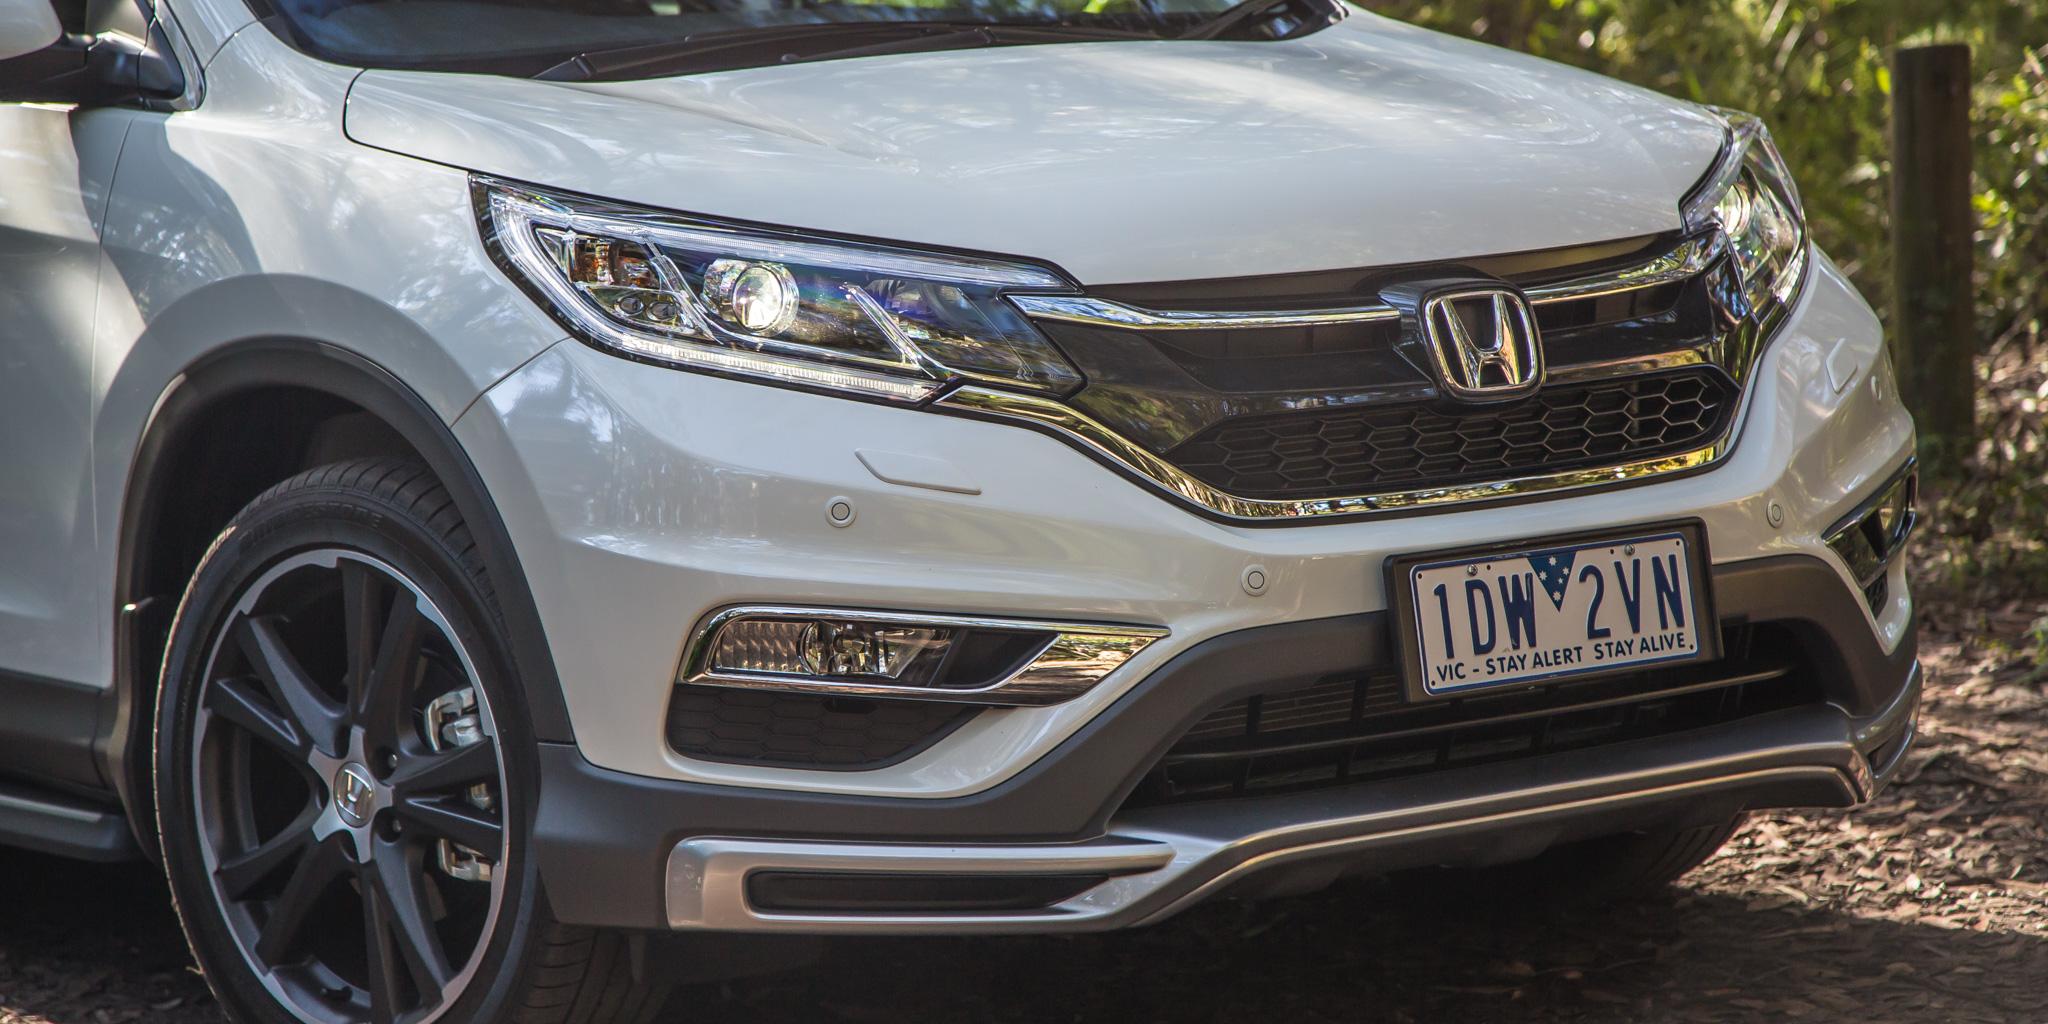 honda article and notes crv test reviews cr drive car touring review v